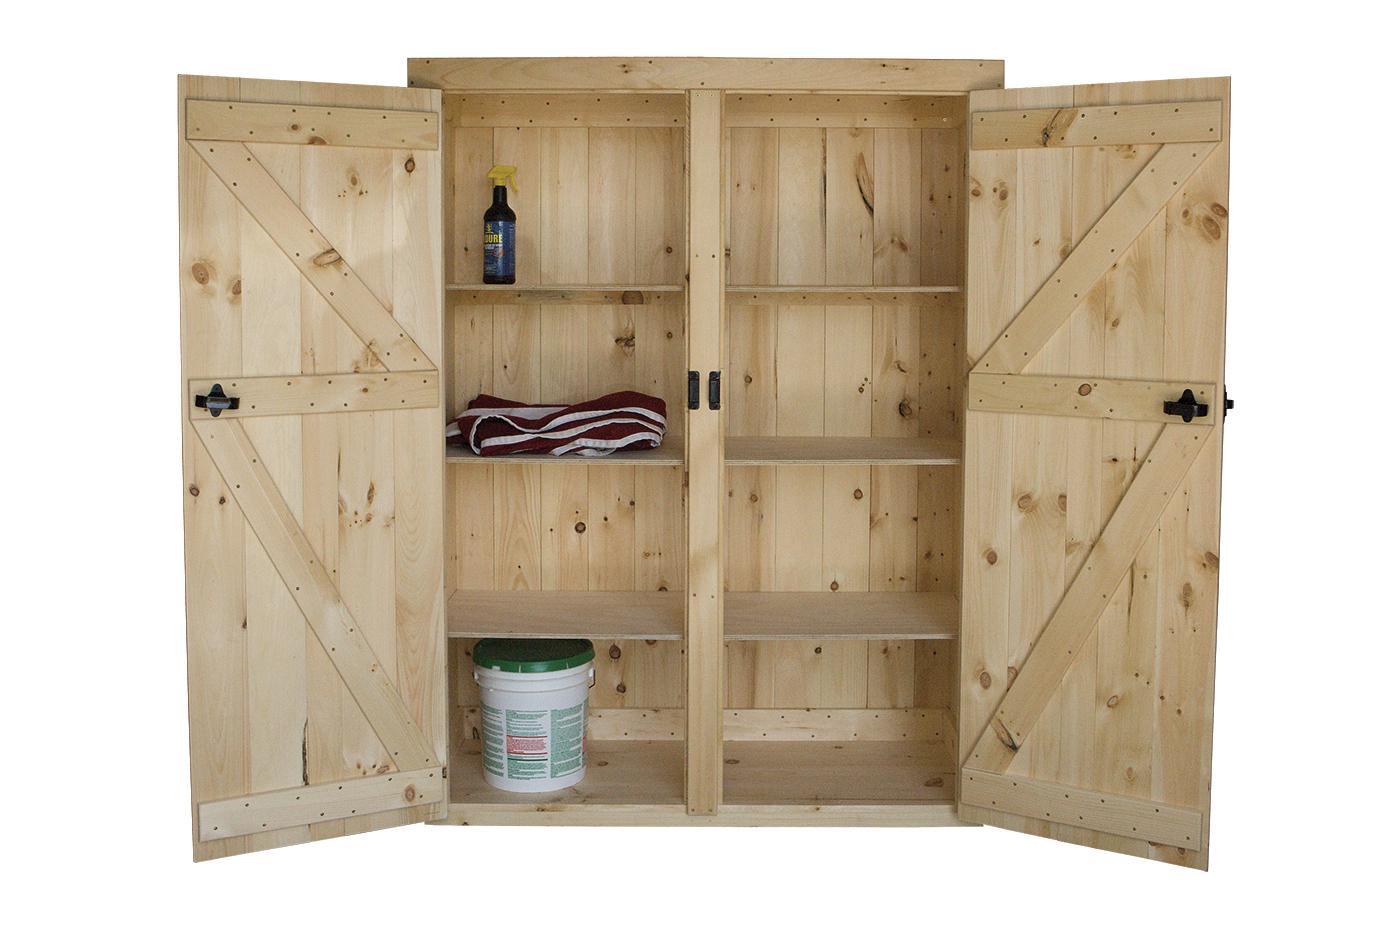 double door cabinet with shelves (open to show interior)